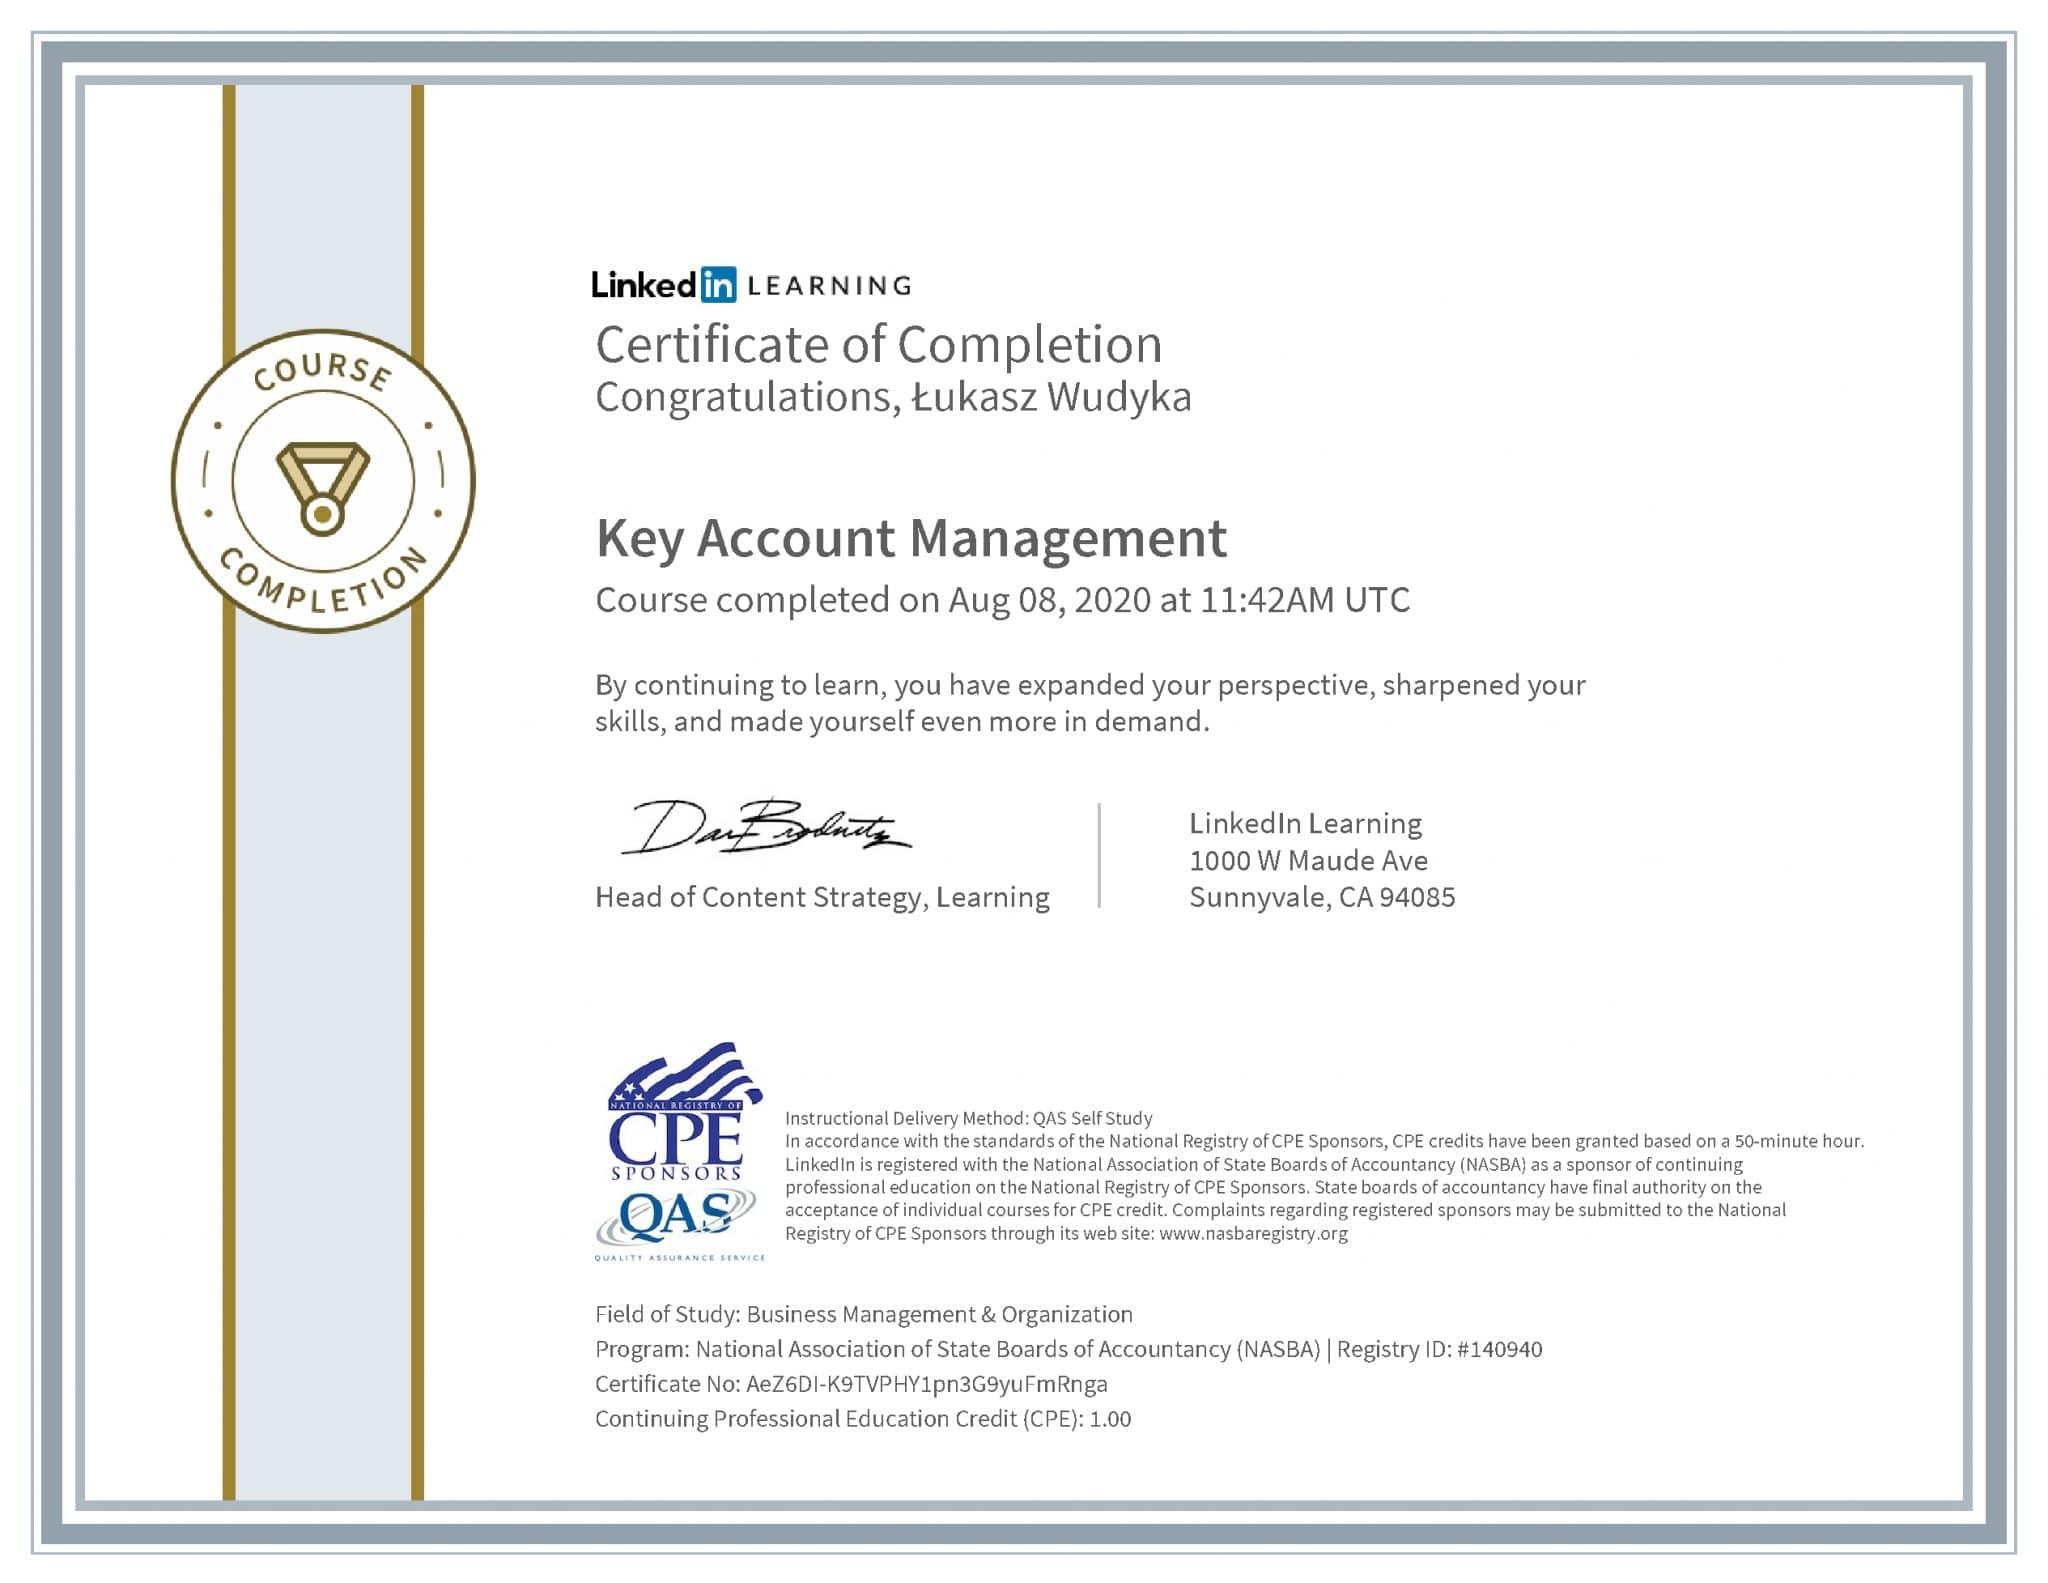 Łukasz Wudyka certyfikat LinkedIn Key Account Management NASBA